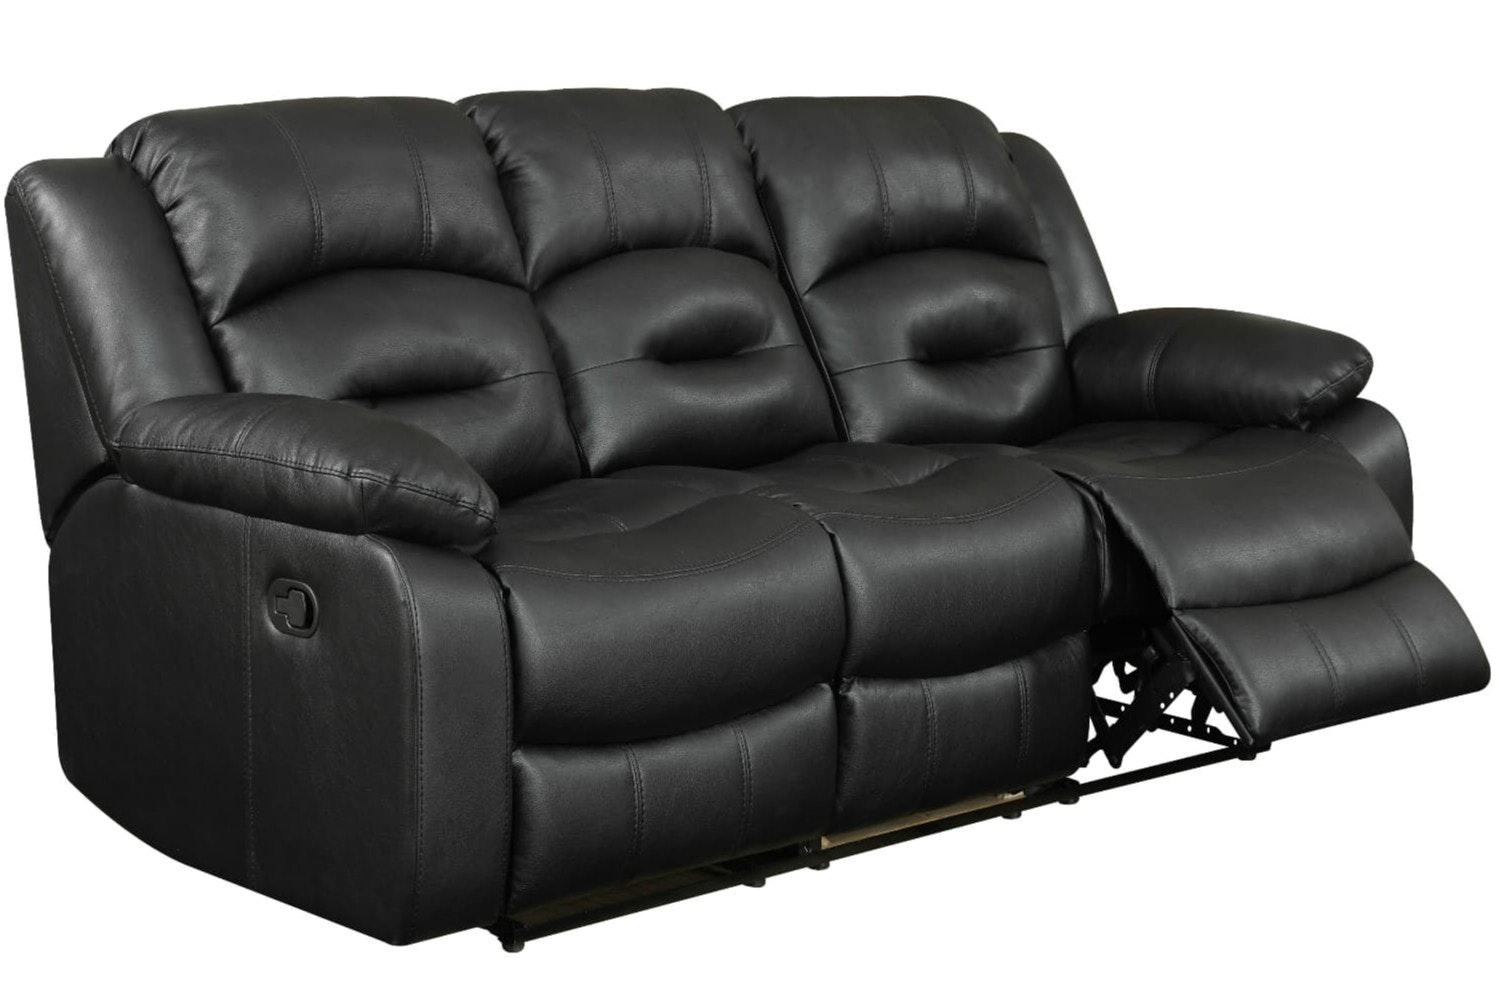 fabric sofas harvey norman ireland